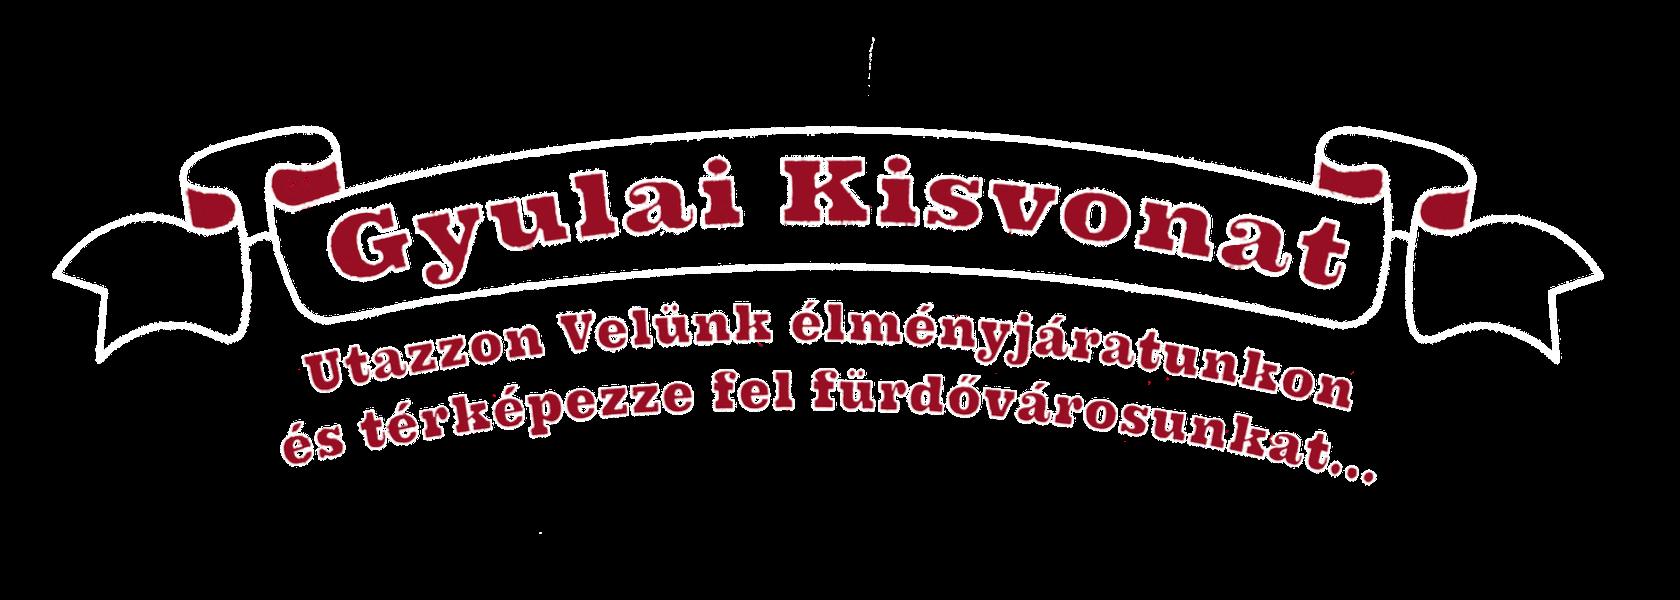 Gyulai Kisvonat Rajzolt Logo